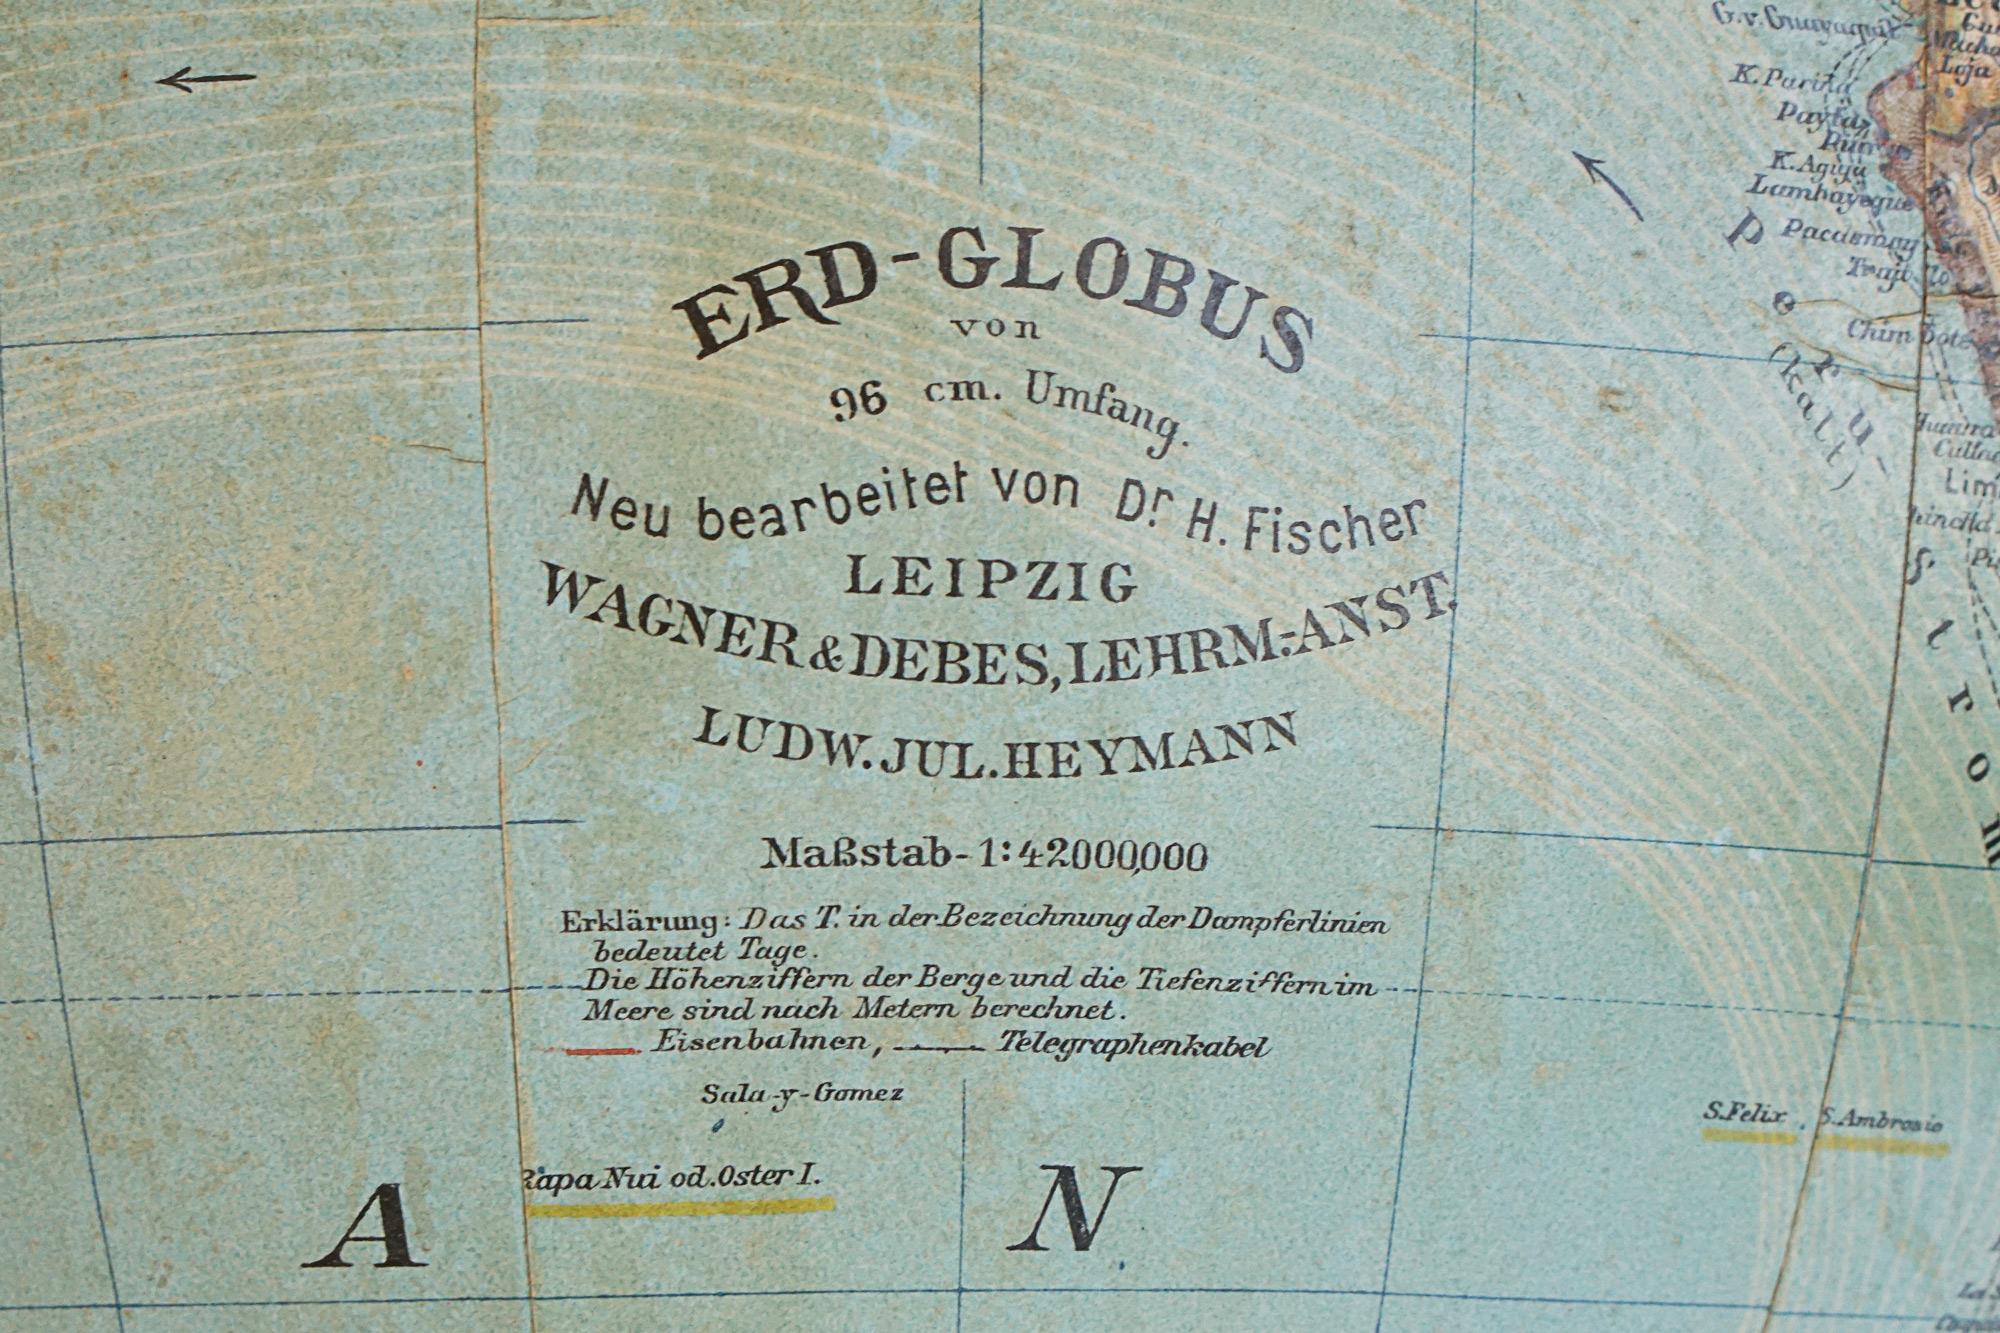 Antique Erd-Globus by Heymann, Leipzig